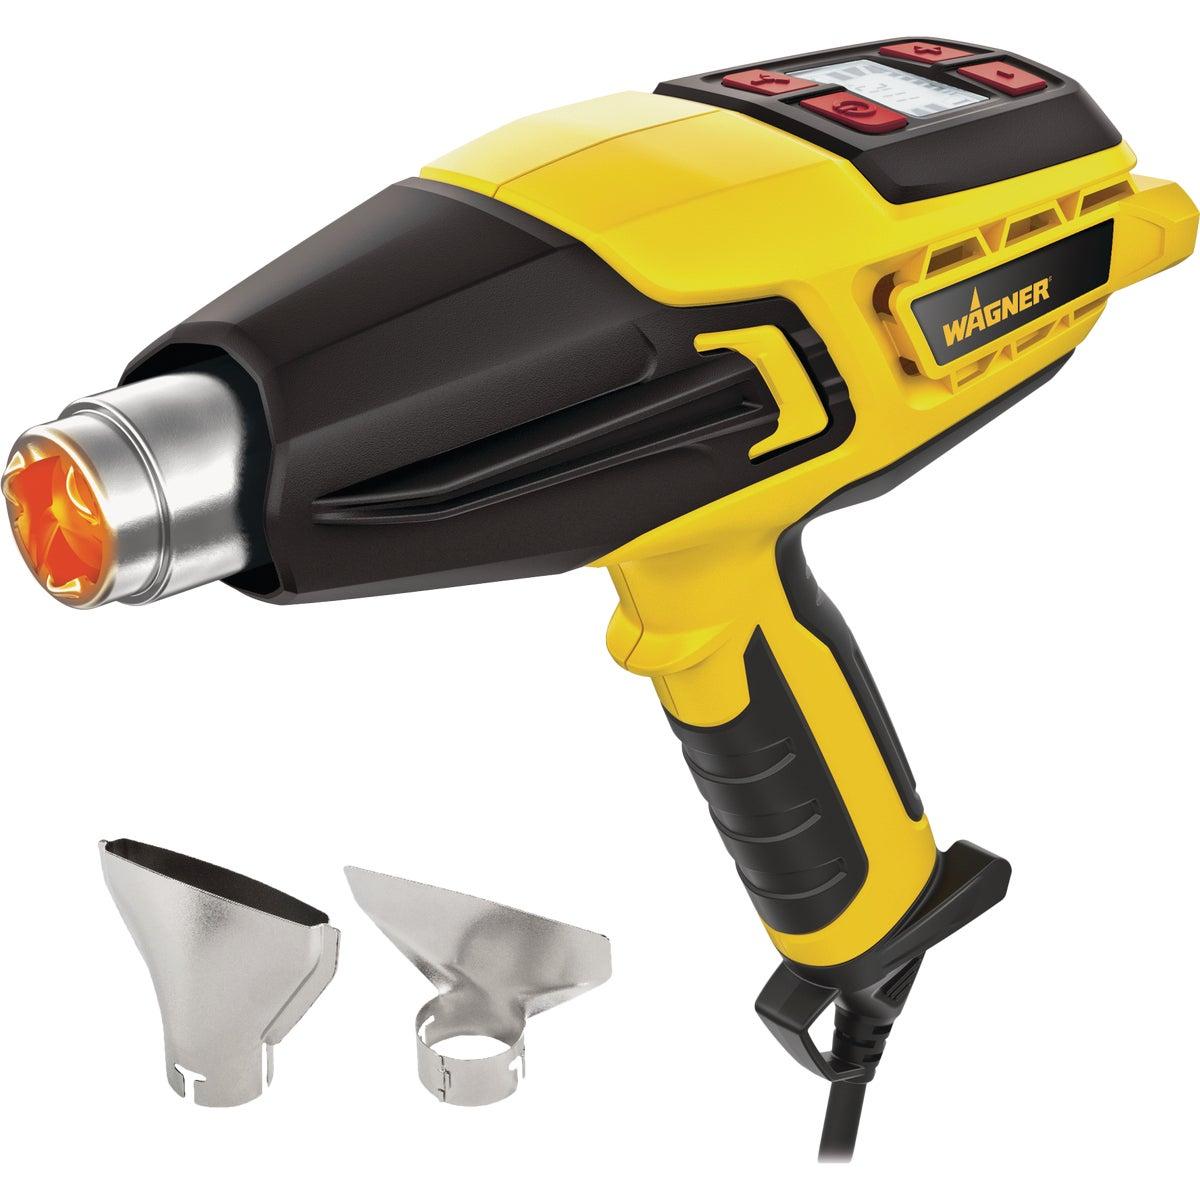 Wagner Spray Tech. INDUSTRIAL HEAT GUN 775